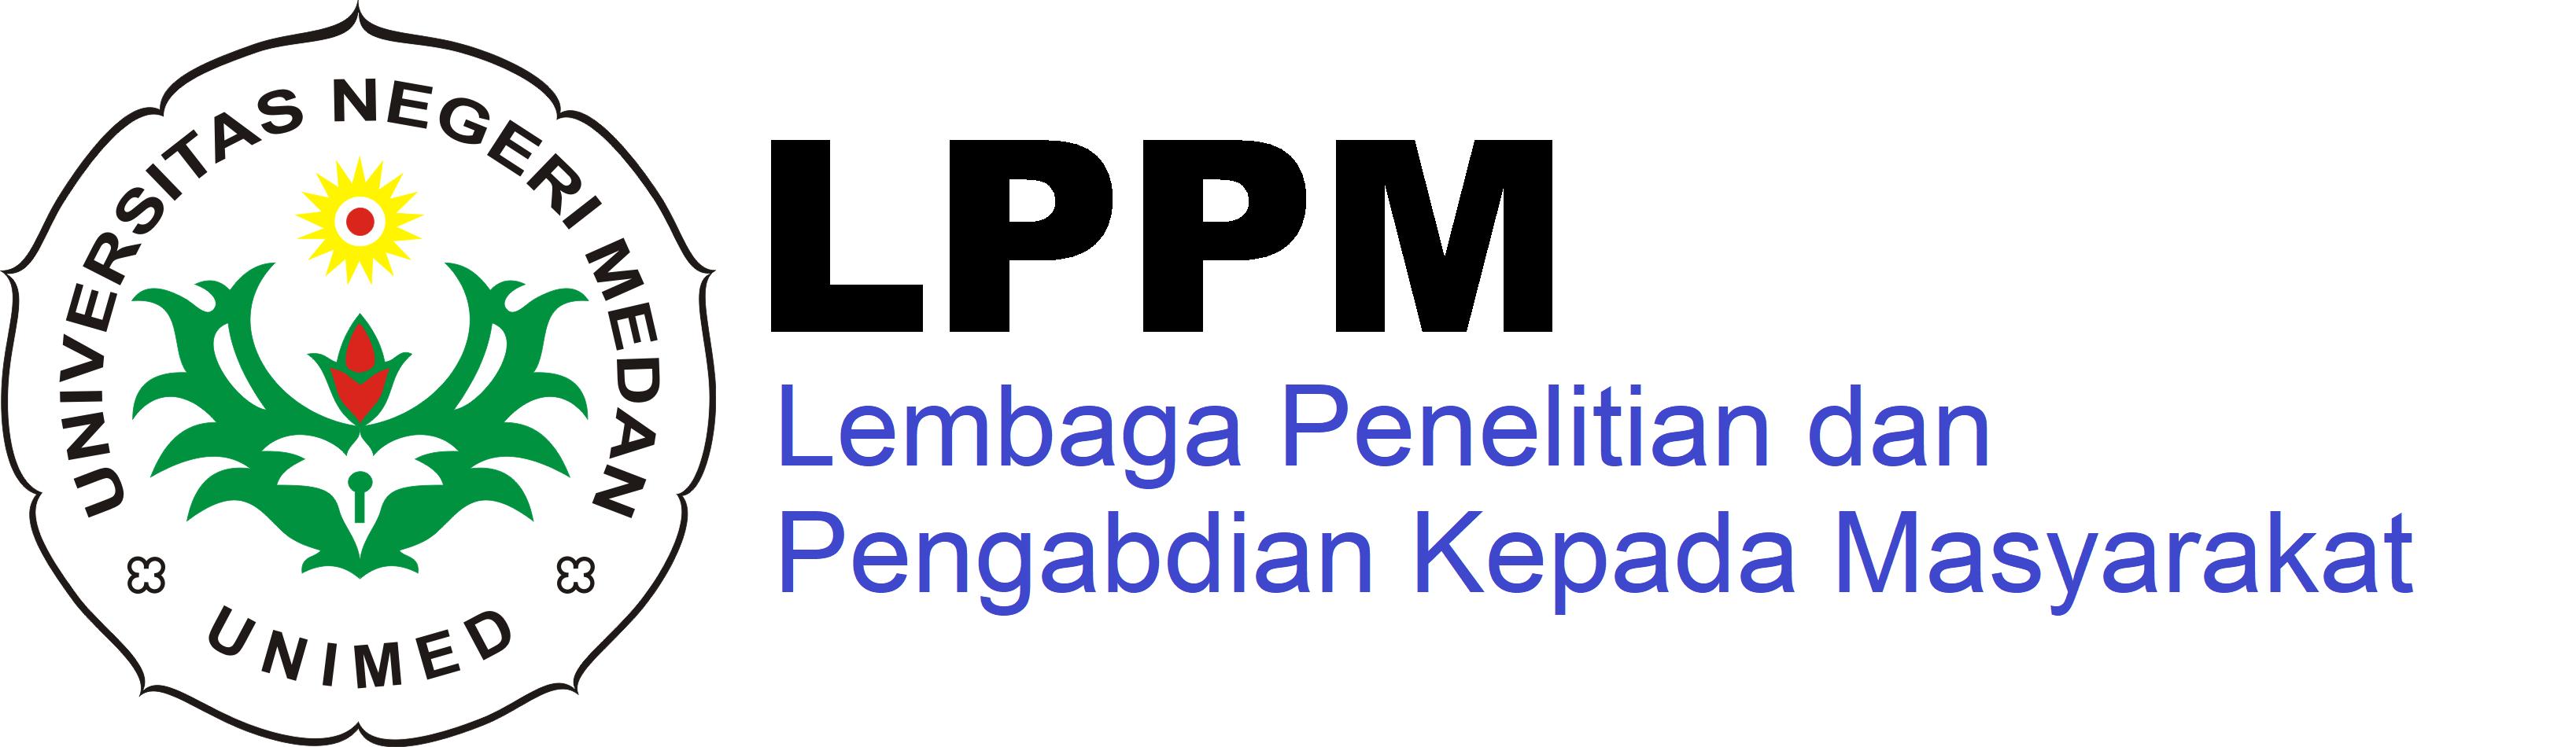 LPPM Universitas Negeri Medan